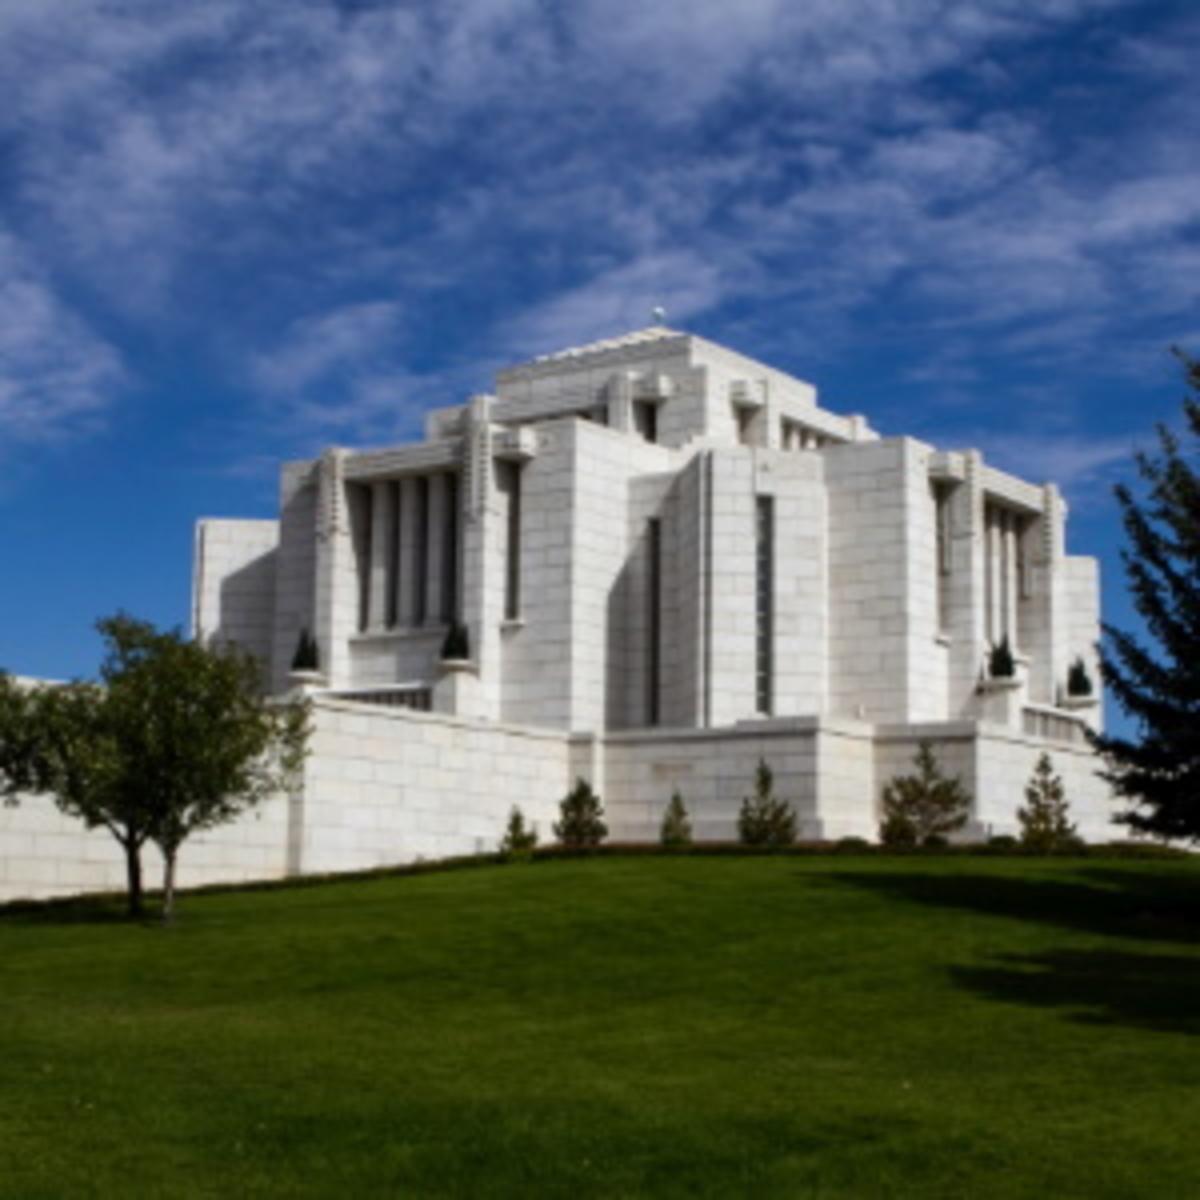 Cardston Alberta Temple